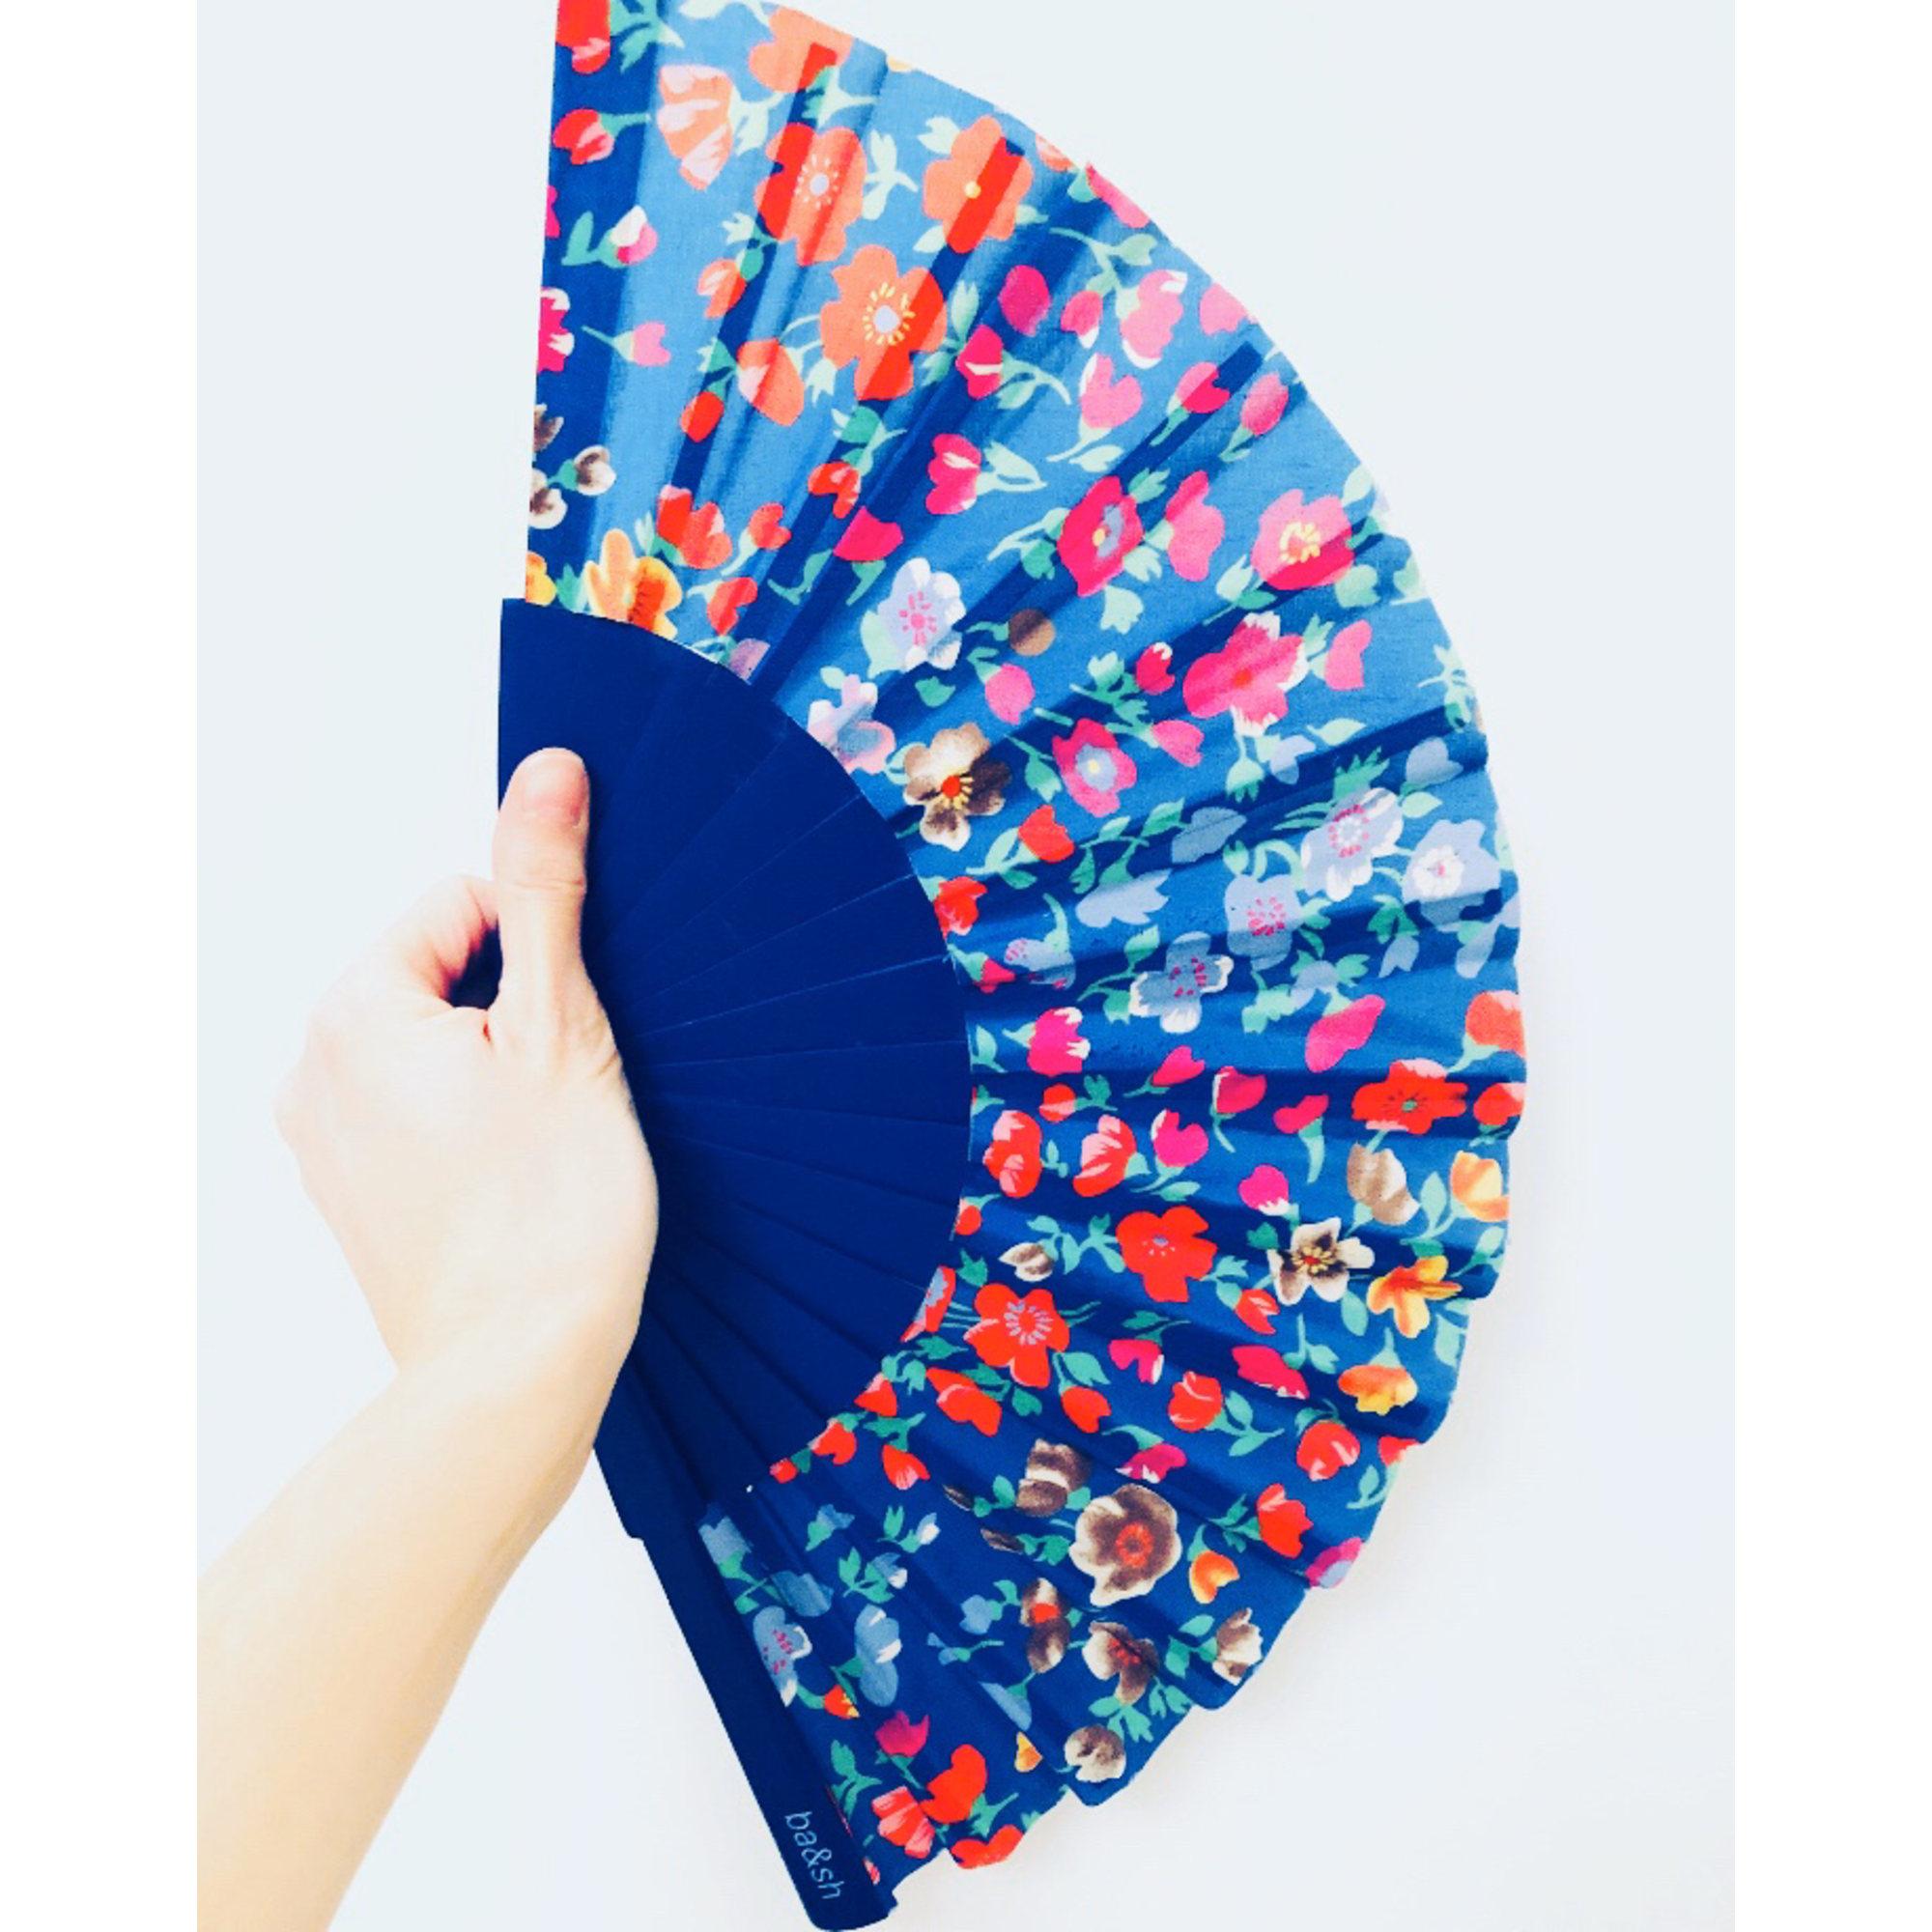 Lunettes de soleil BA&SH Bleu, bleu marine, bleu turquoise